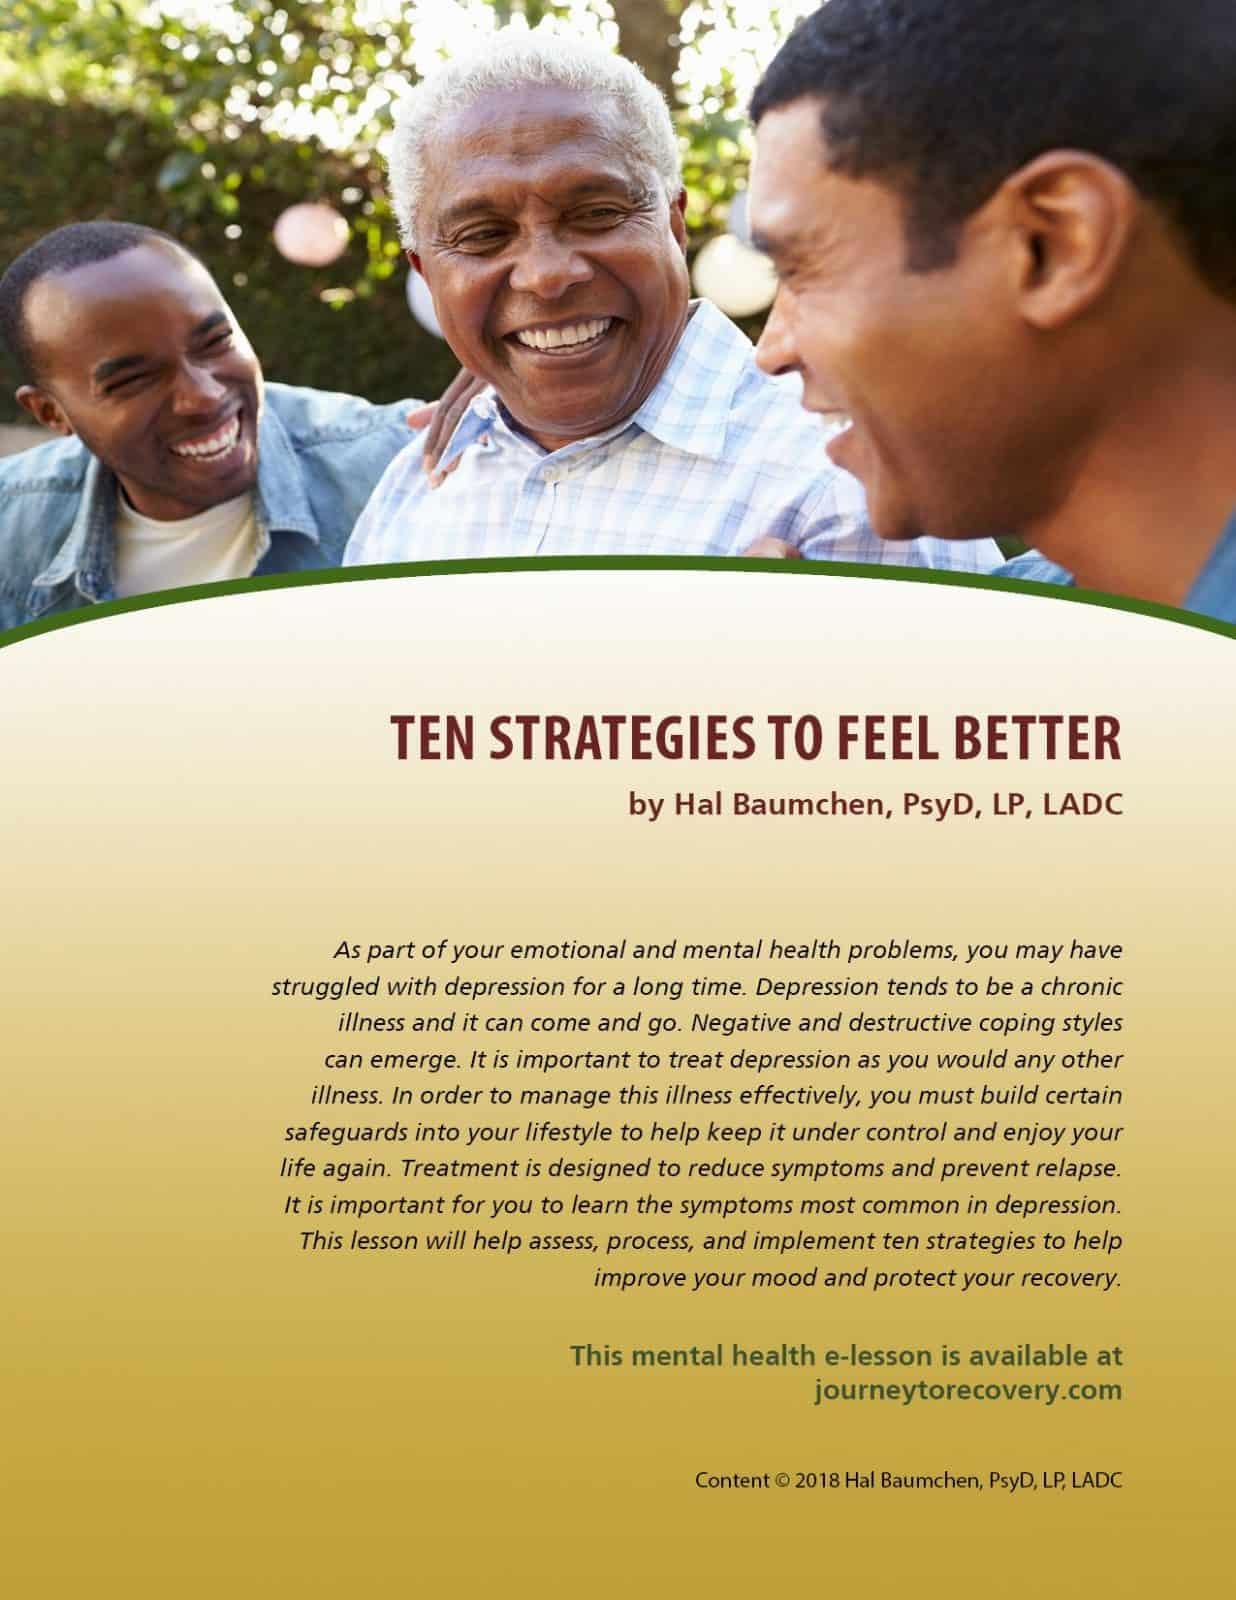 Ten Strategies to Feel Better (MH Lesson)